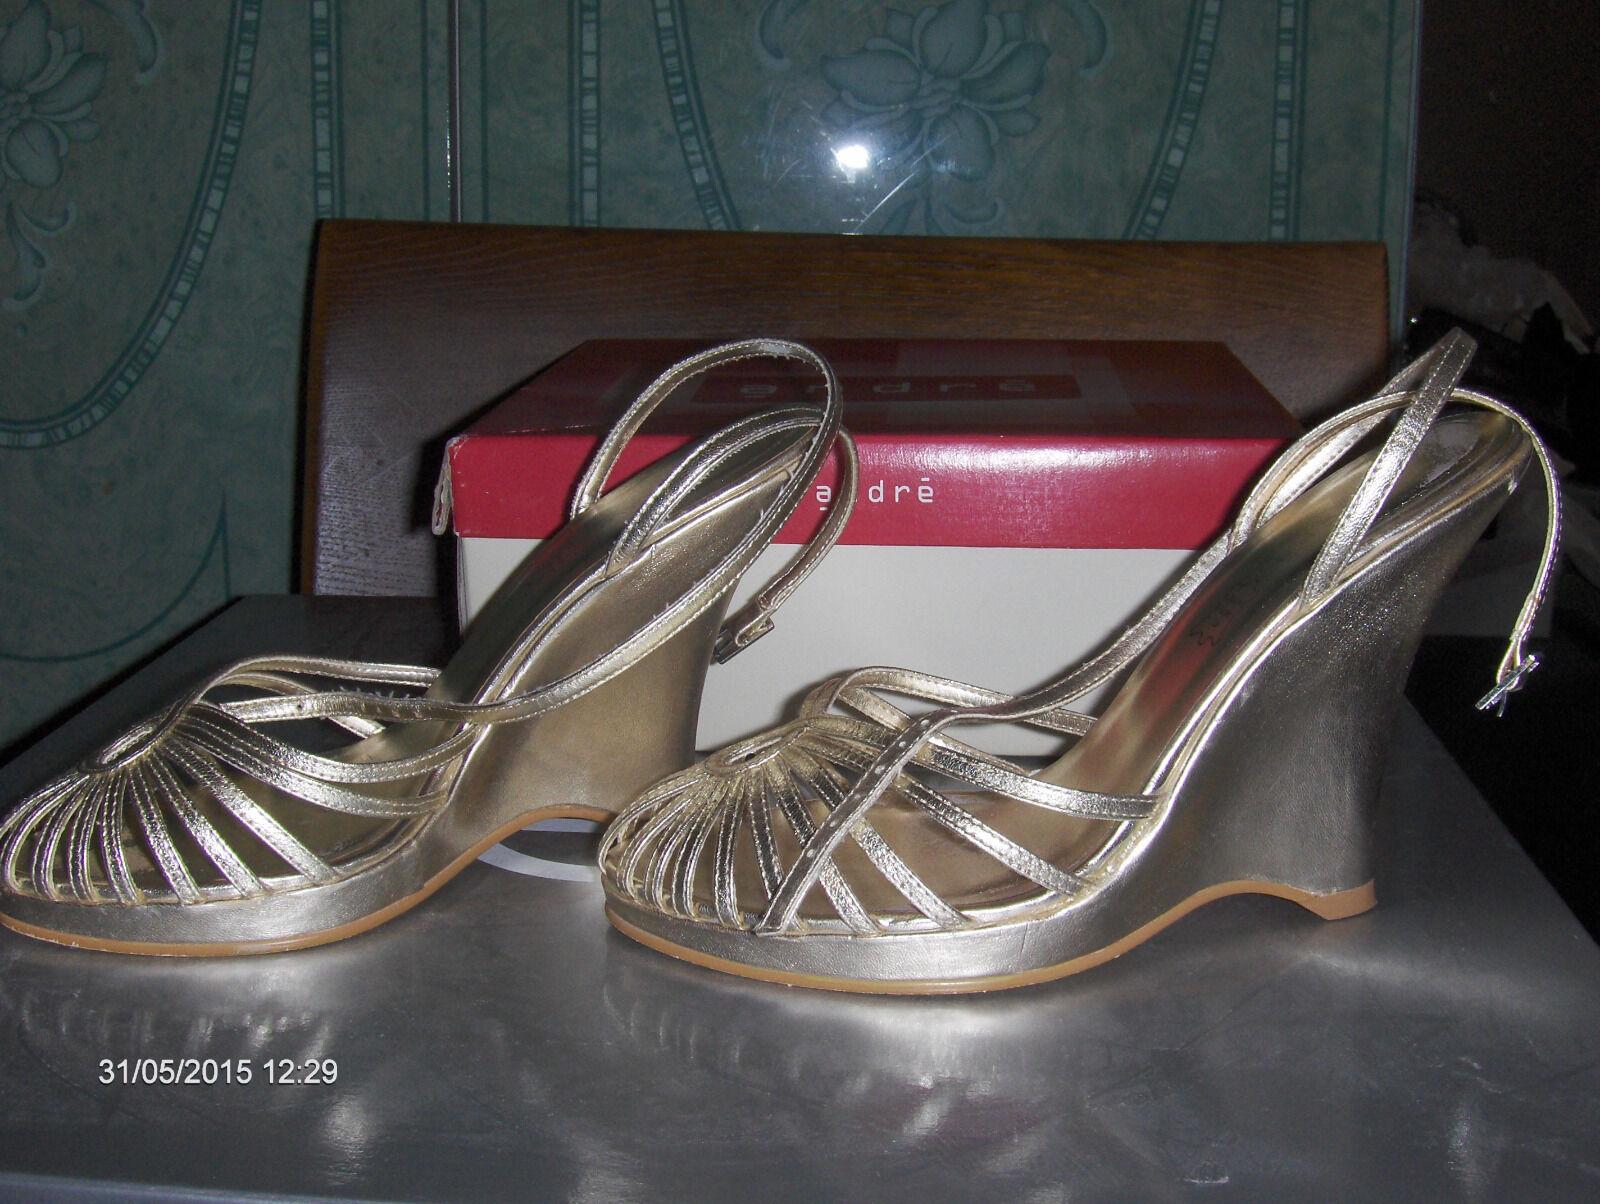 Sandaletten Abendschuhe ANDRE Echt Leder Gold Paris Galerie Lafayette Gr 38 Top